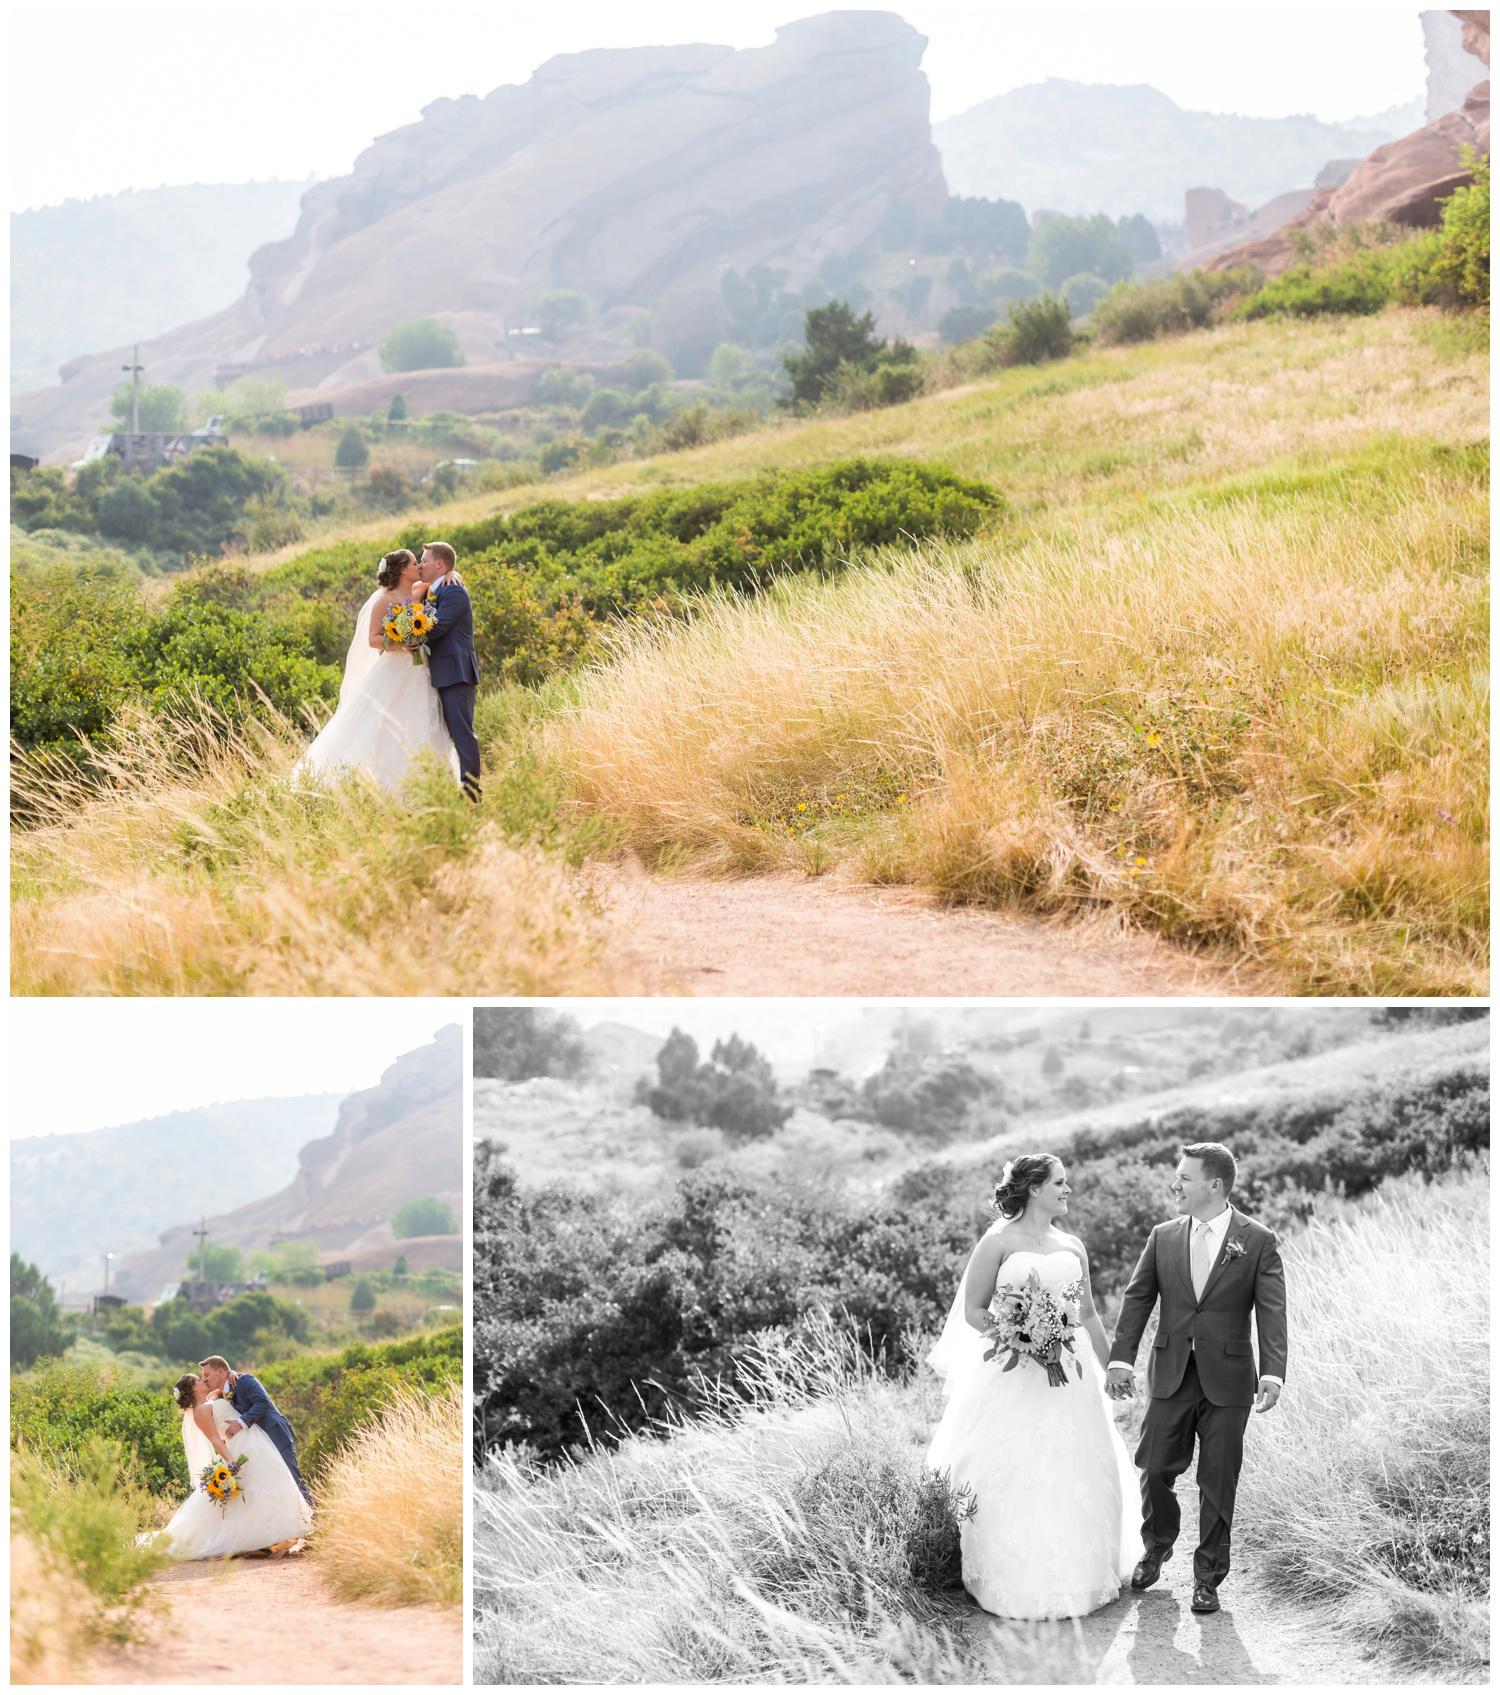 red rocks wedding photography014.jpg